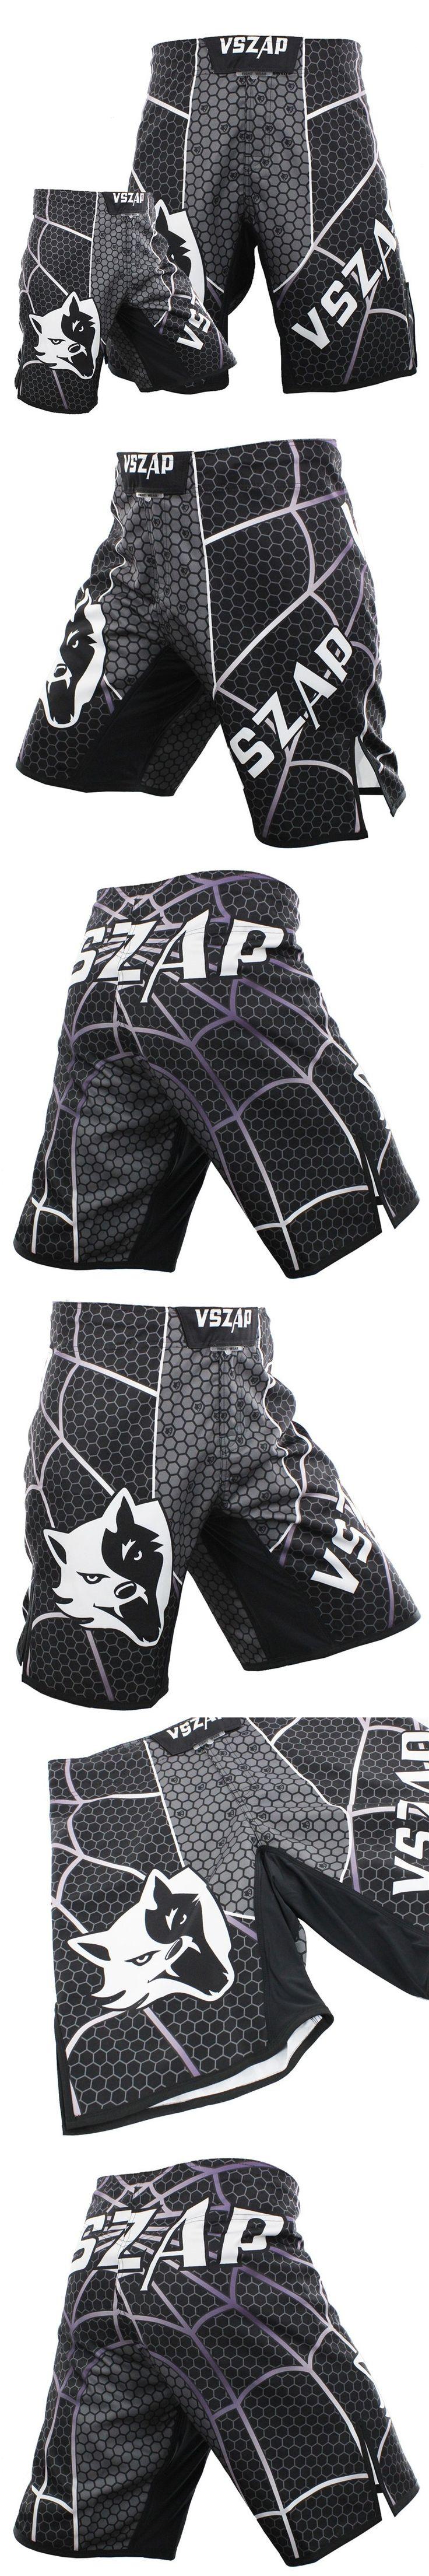 VSZAP MMA shorts kick  muay thai shorts trunks mma cheap shorts camo muay thai sanda boxe fight wear yokkao bermuda